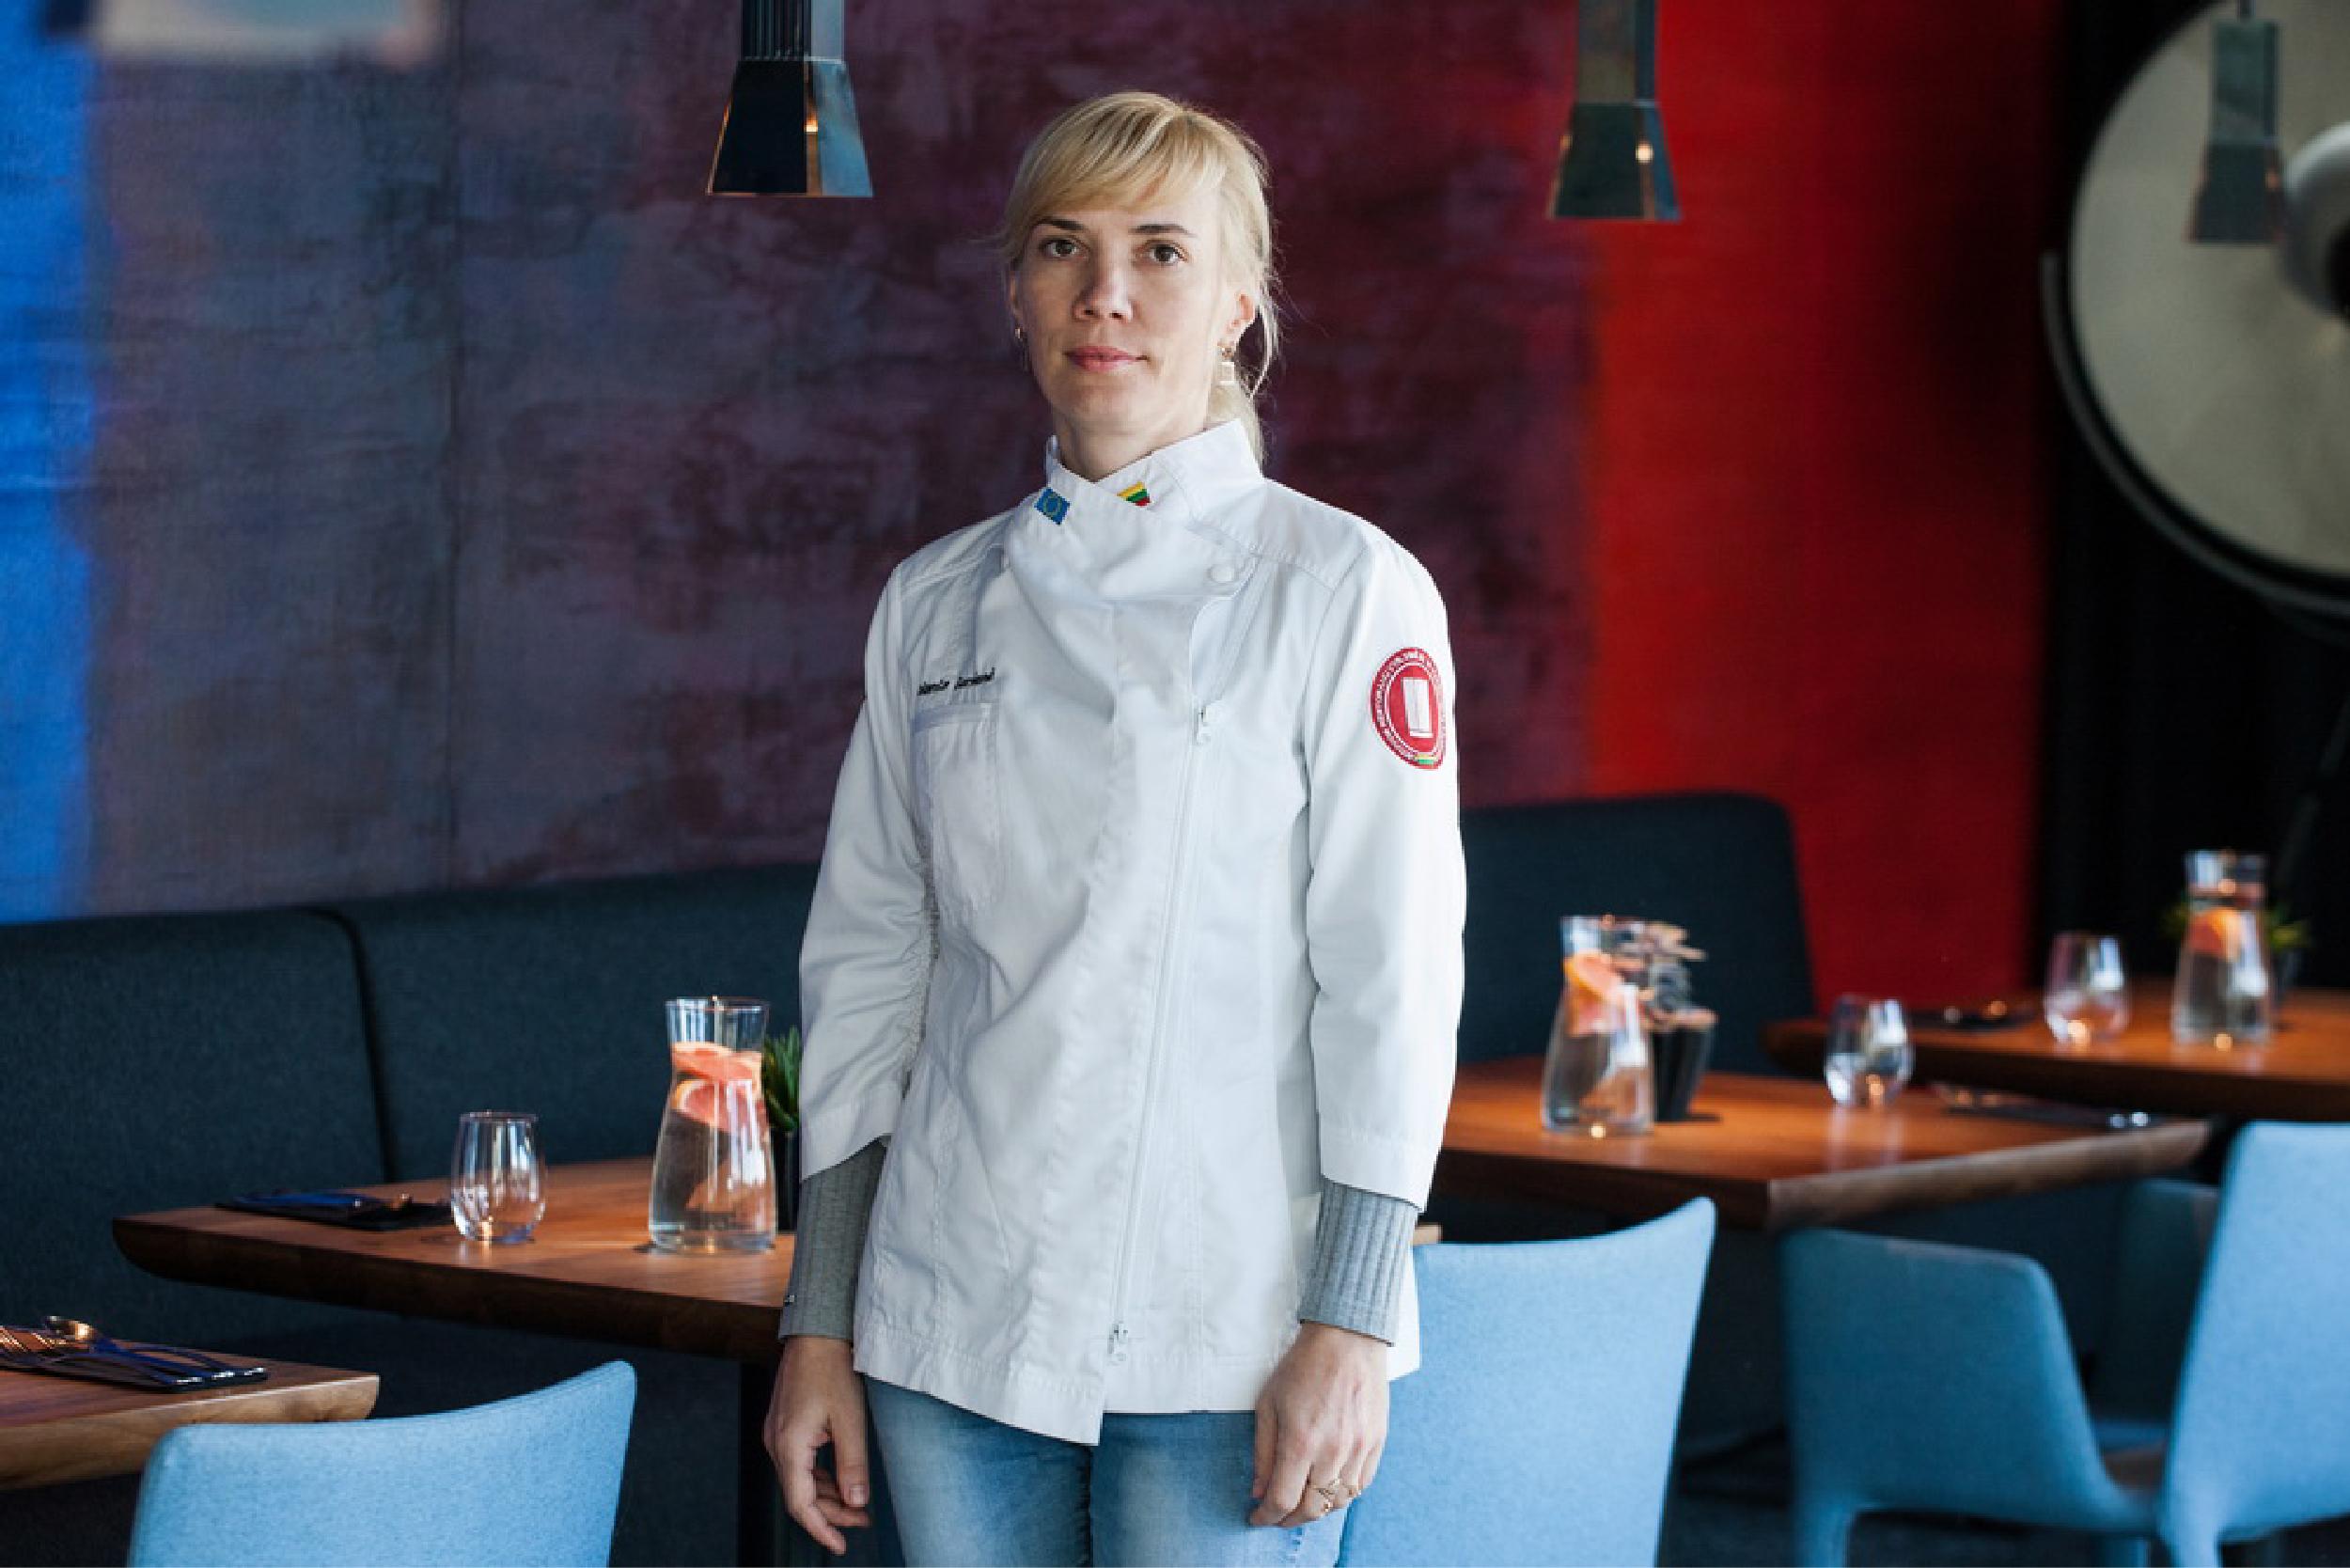 Virtuvės šefė Jolanta Gervienė